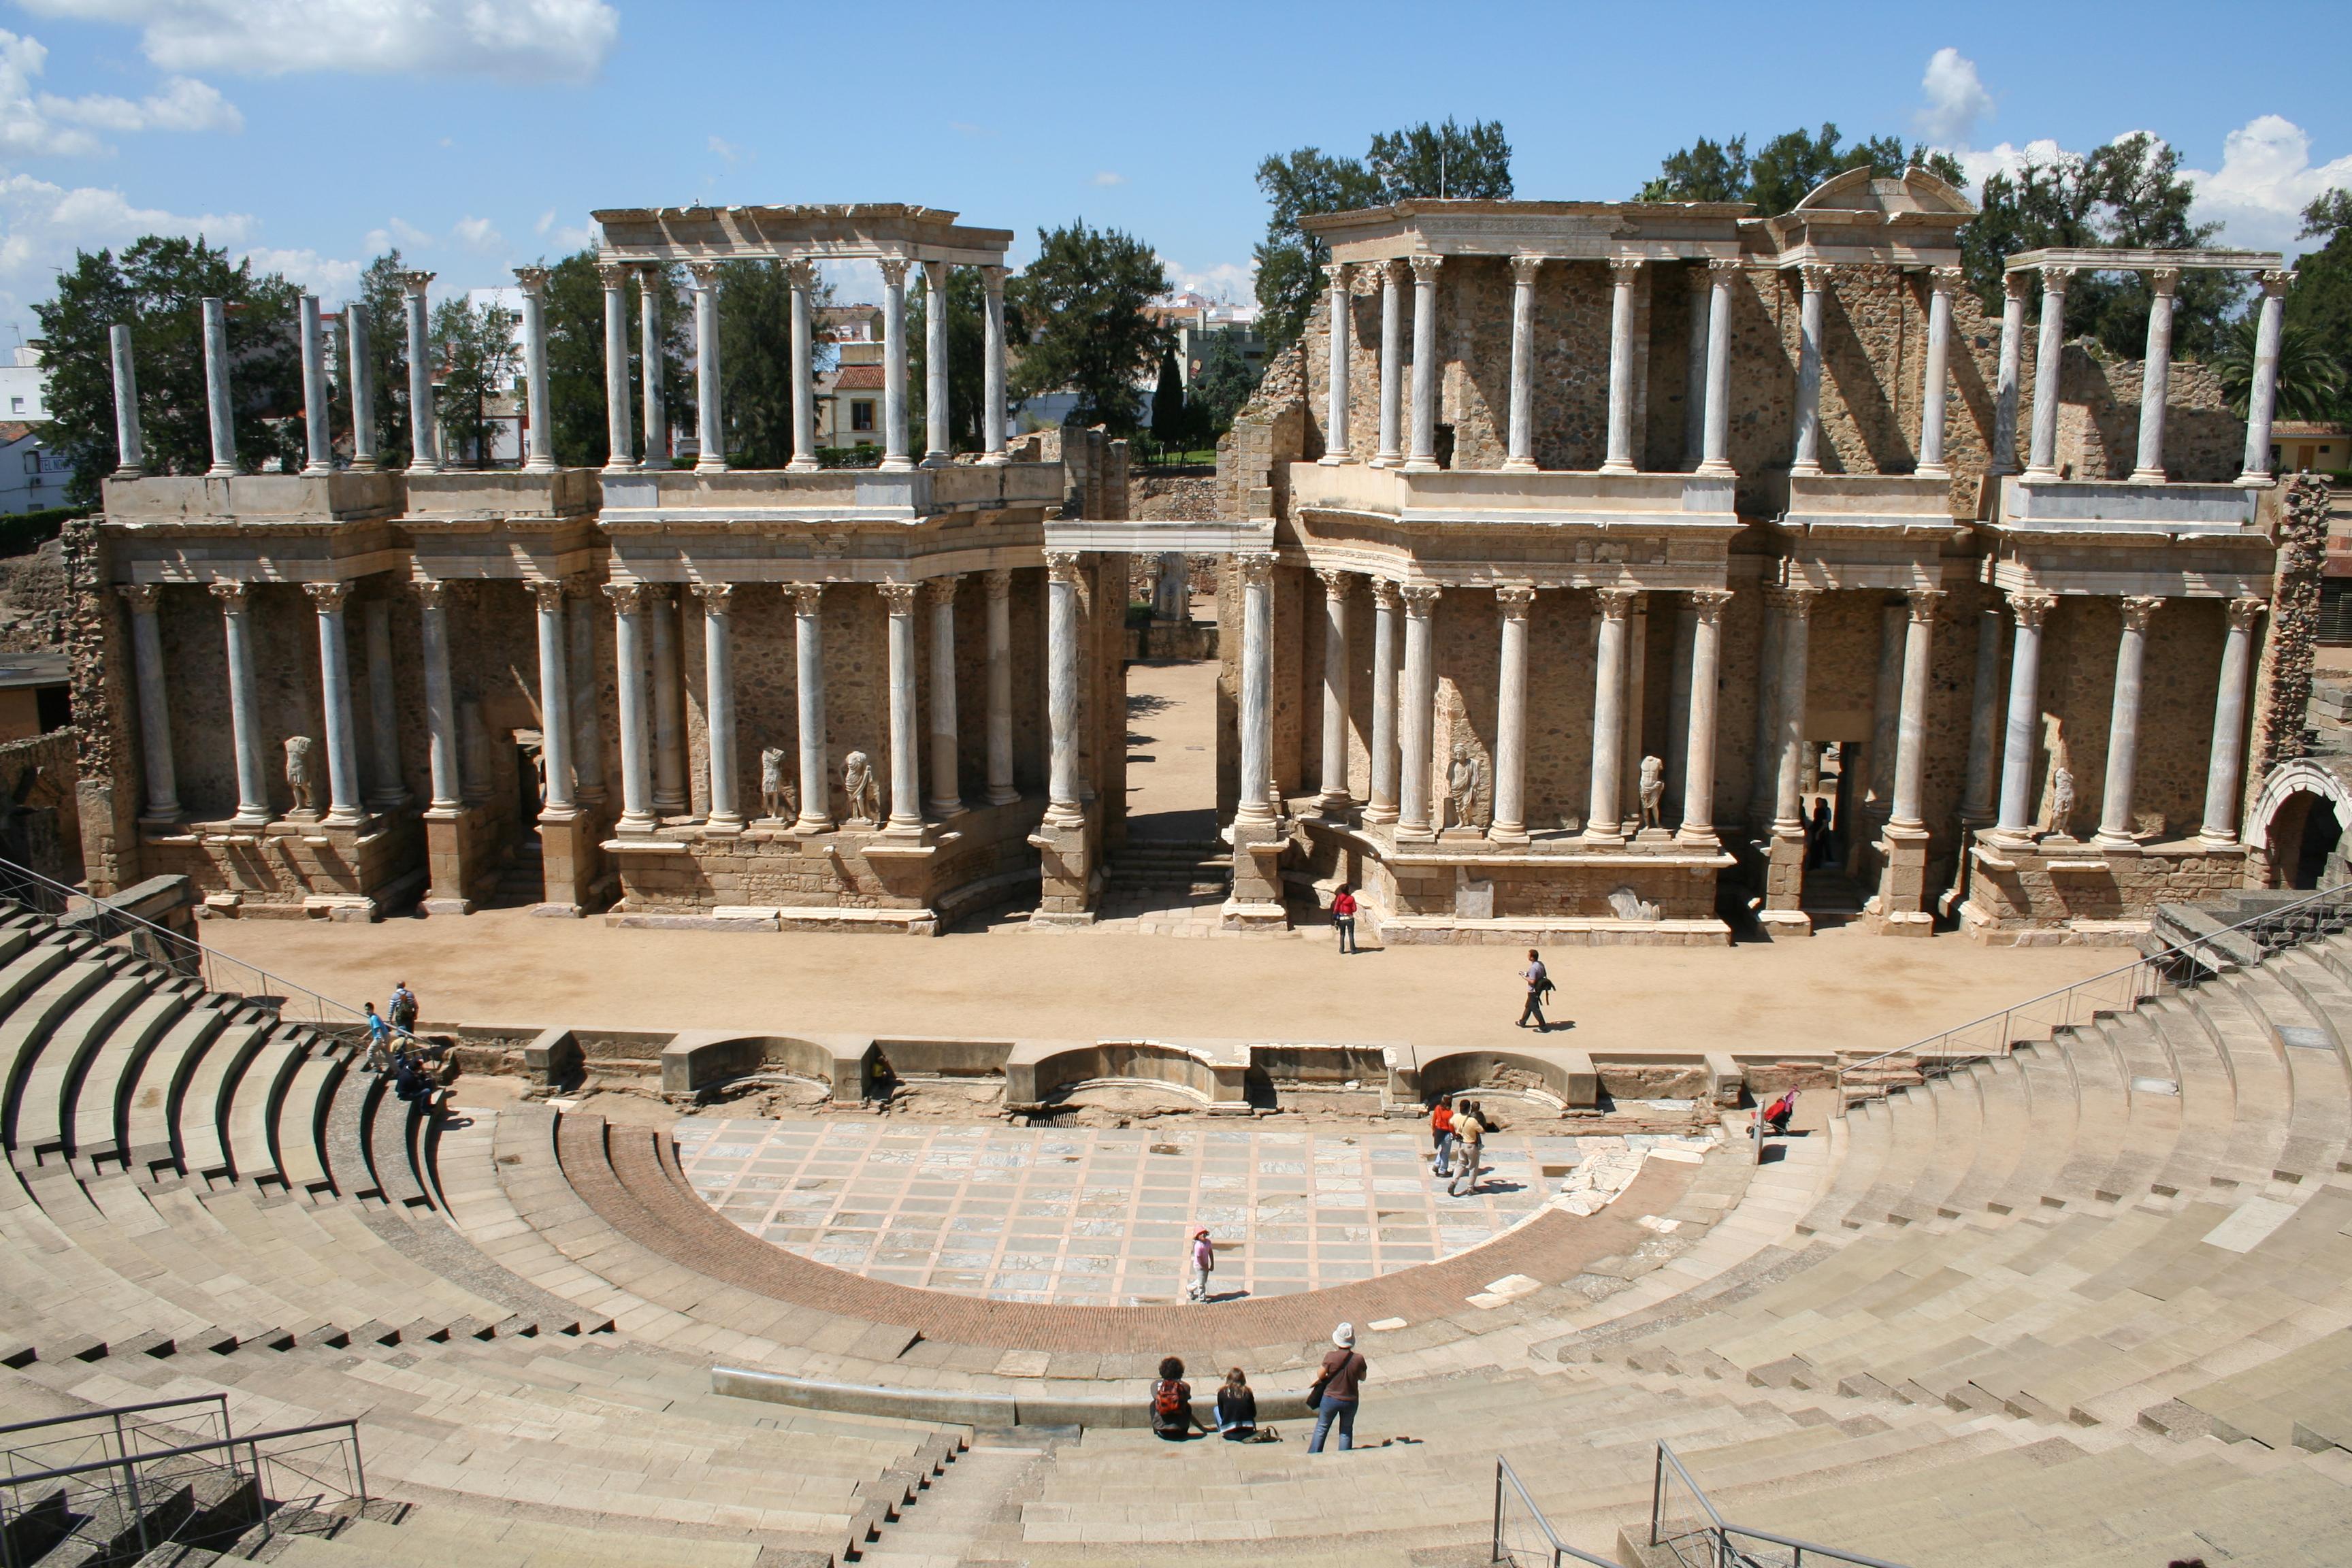 Boda Teatro Romano Merida : El teatro es mérida jmmlimia s ideas